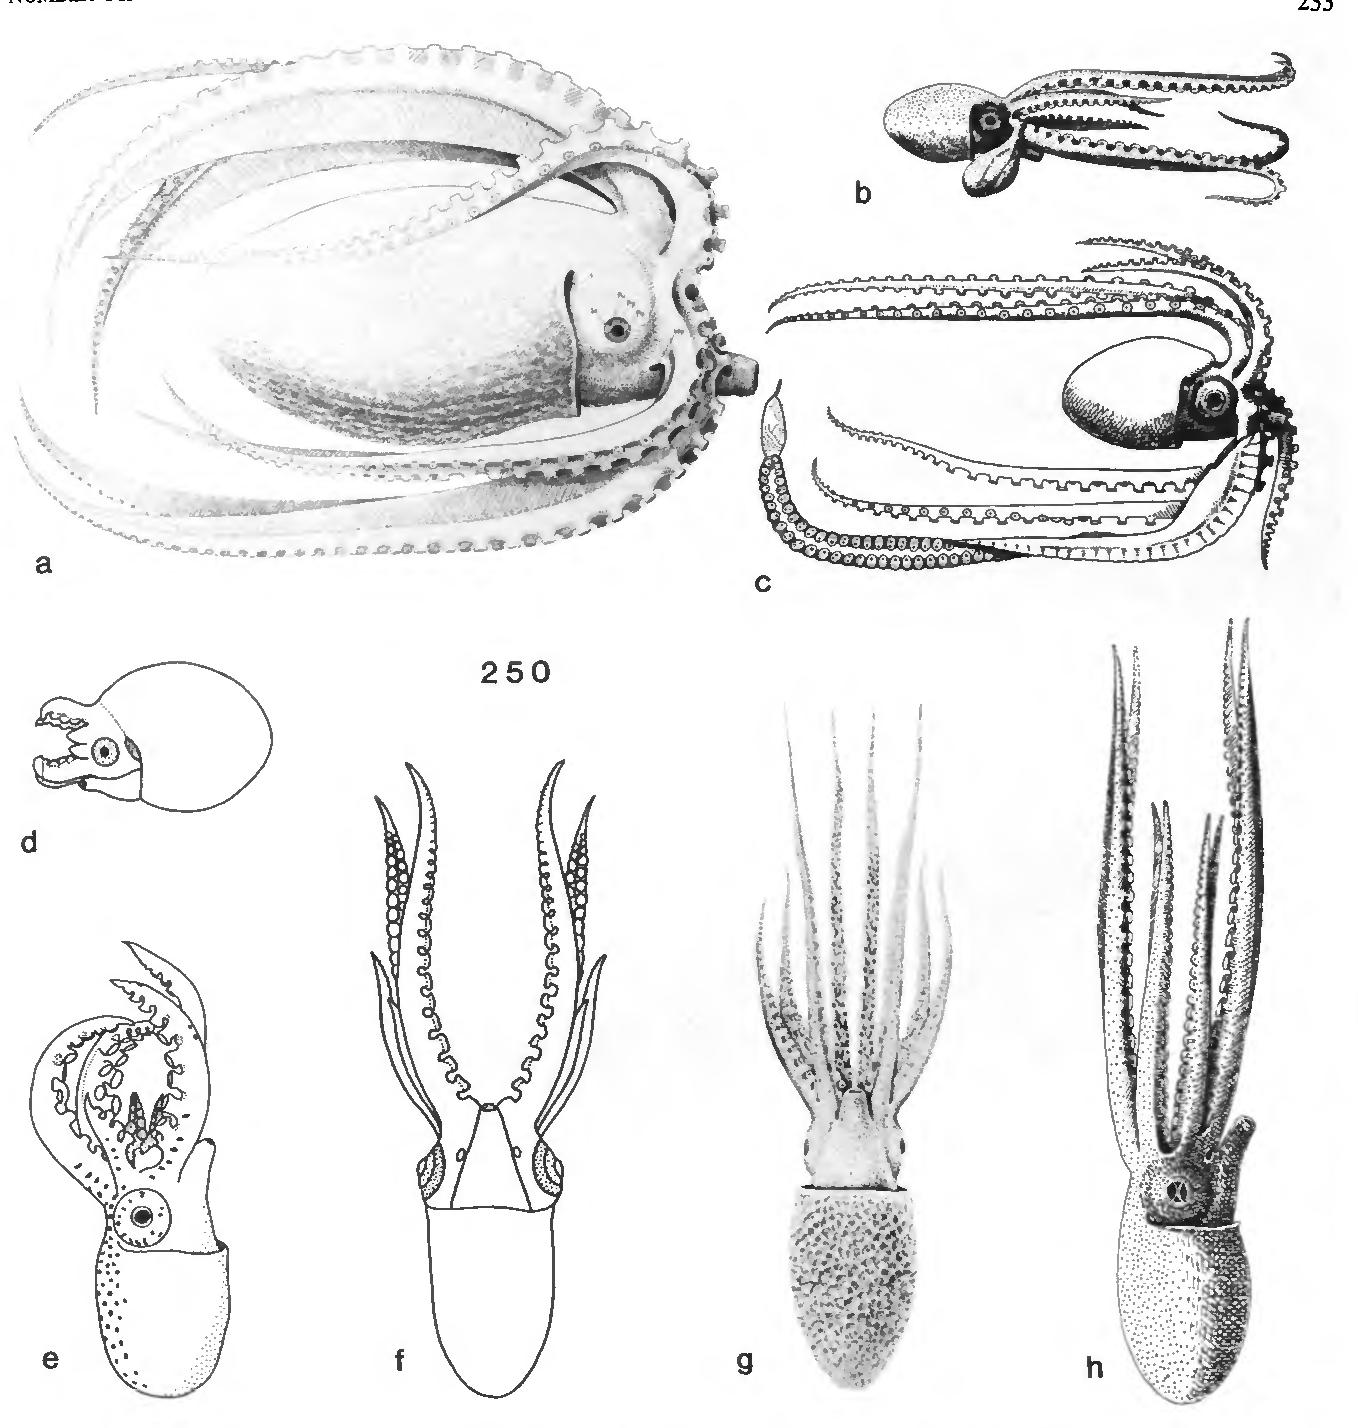 figure 250